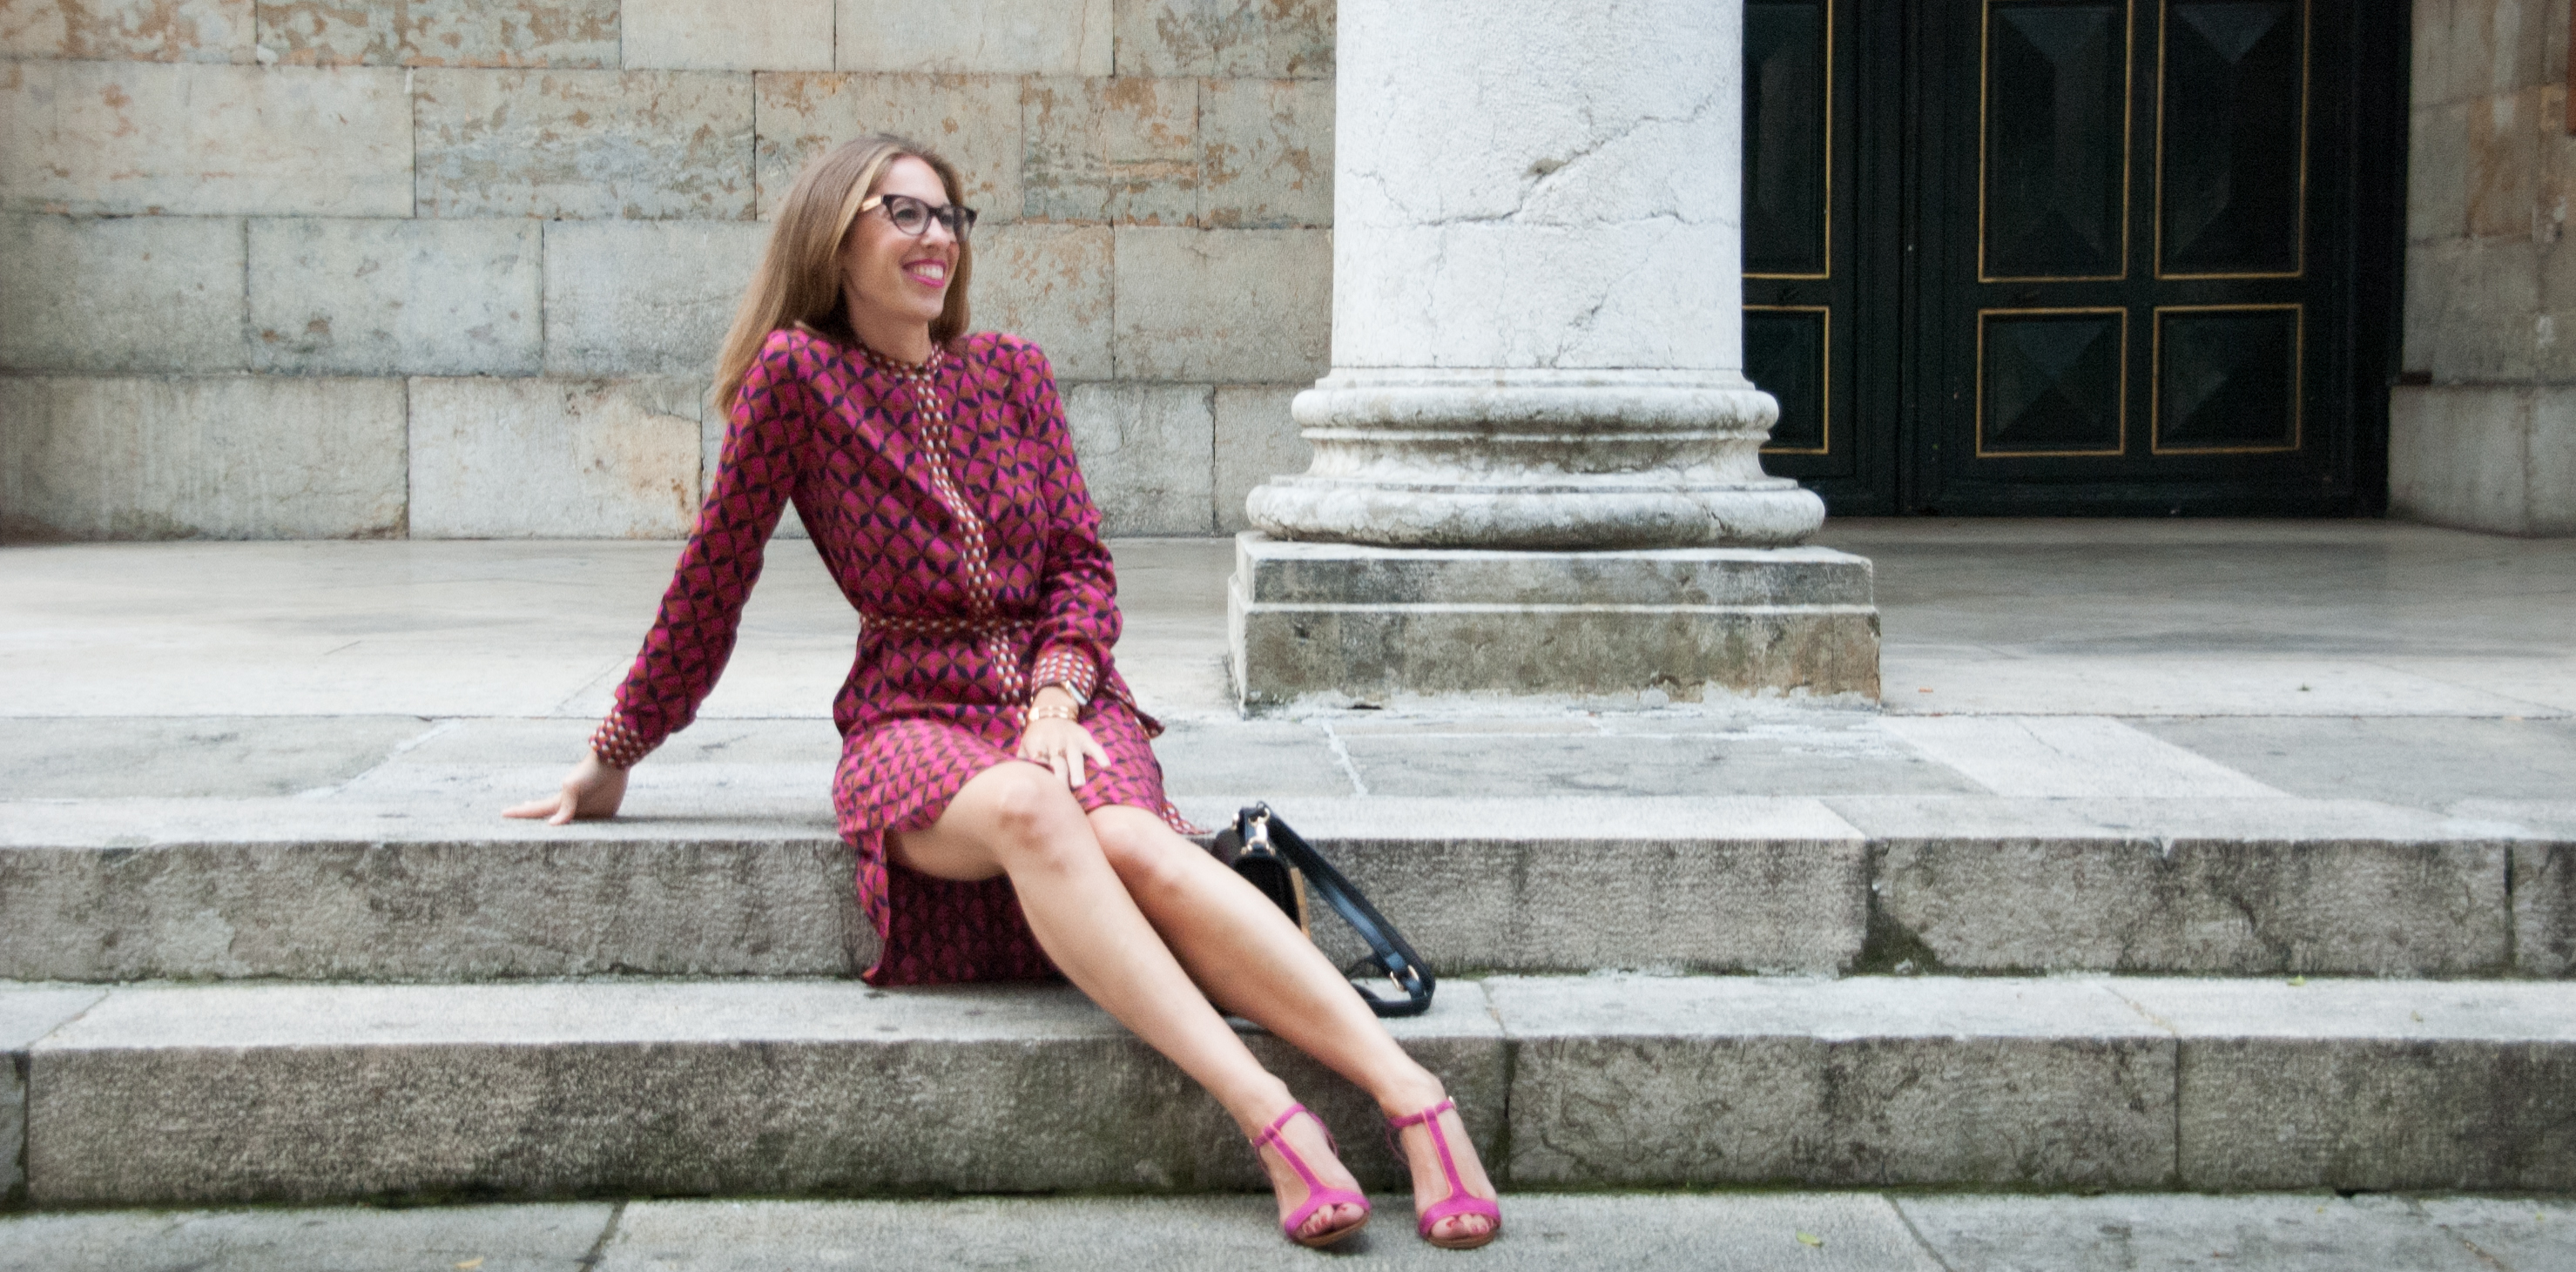 vestido_camisero-13